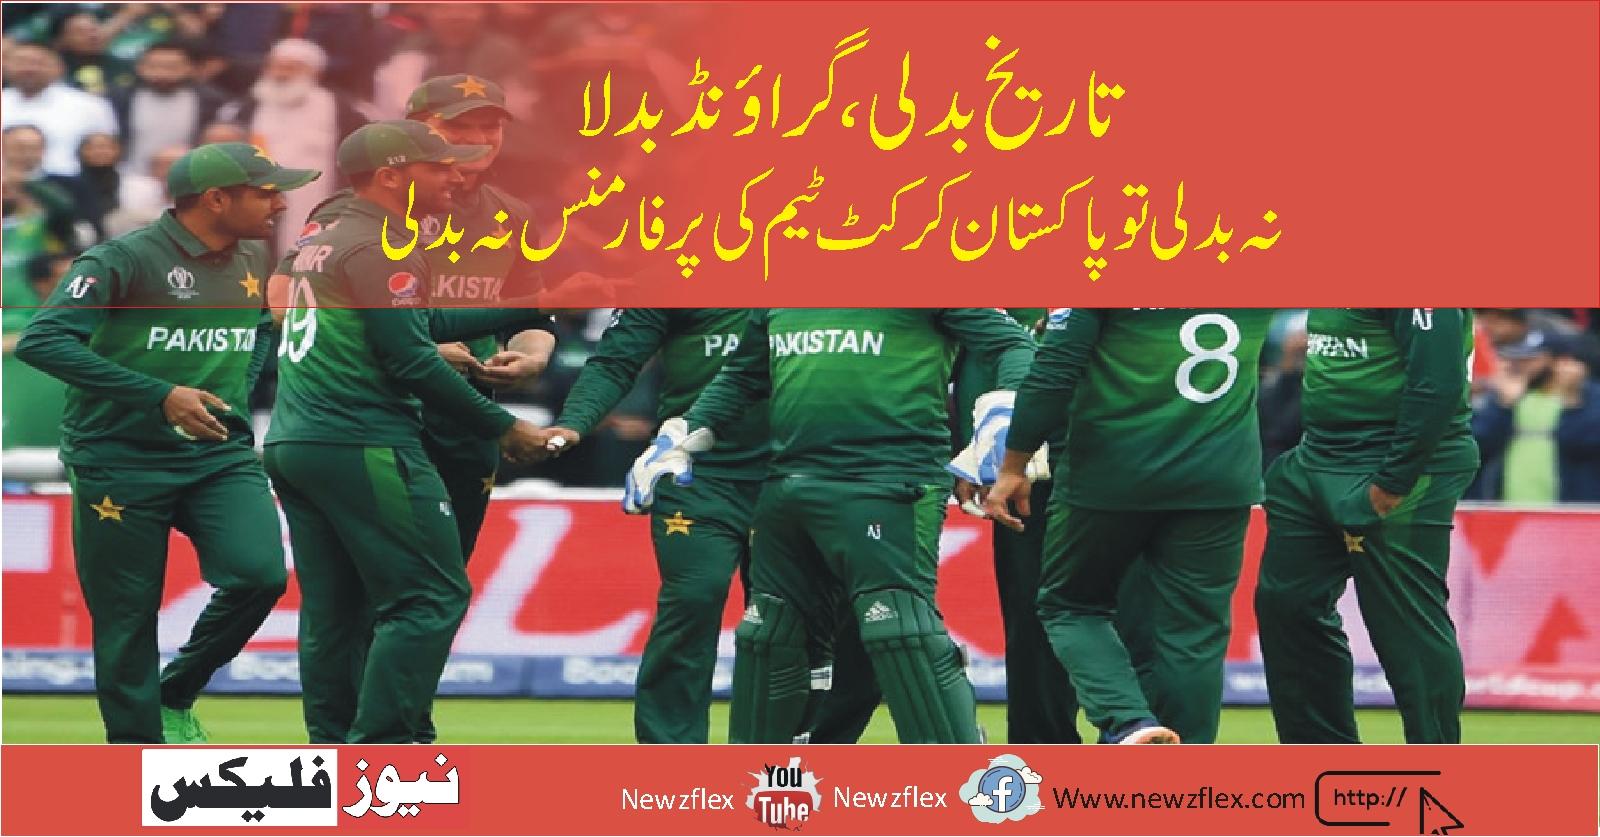 تاریخ بدلی گراؤنڈ بدلا نہ بدلی تو پاکستان کرکٹ ٹیم کی پرفارمنس نہ بدلی